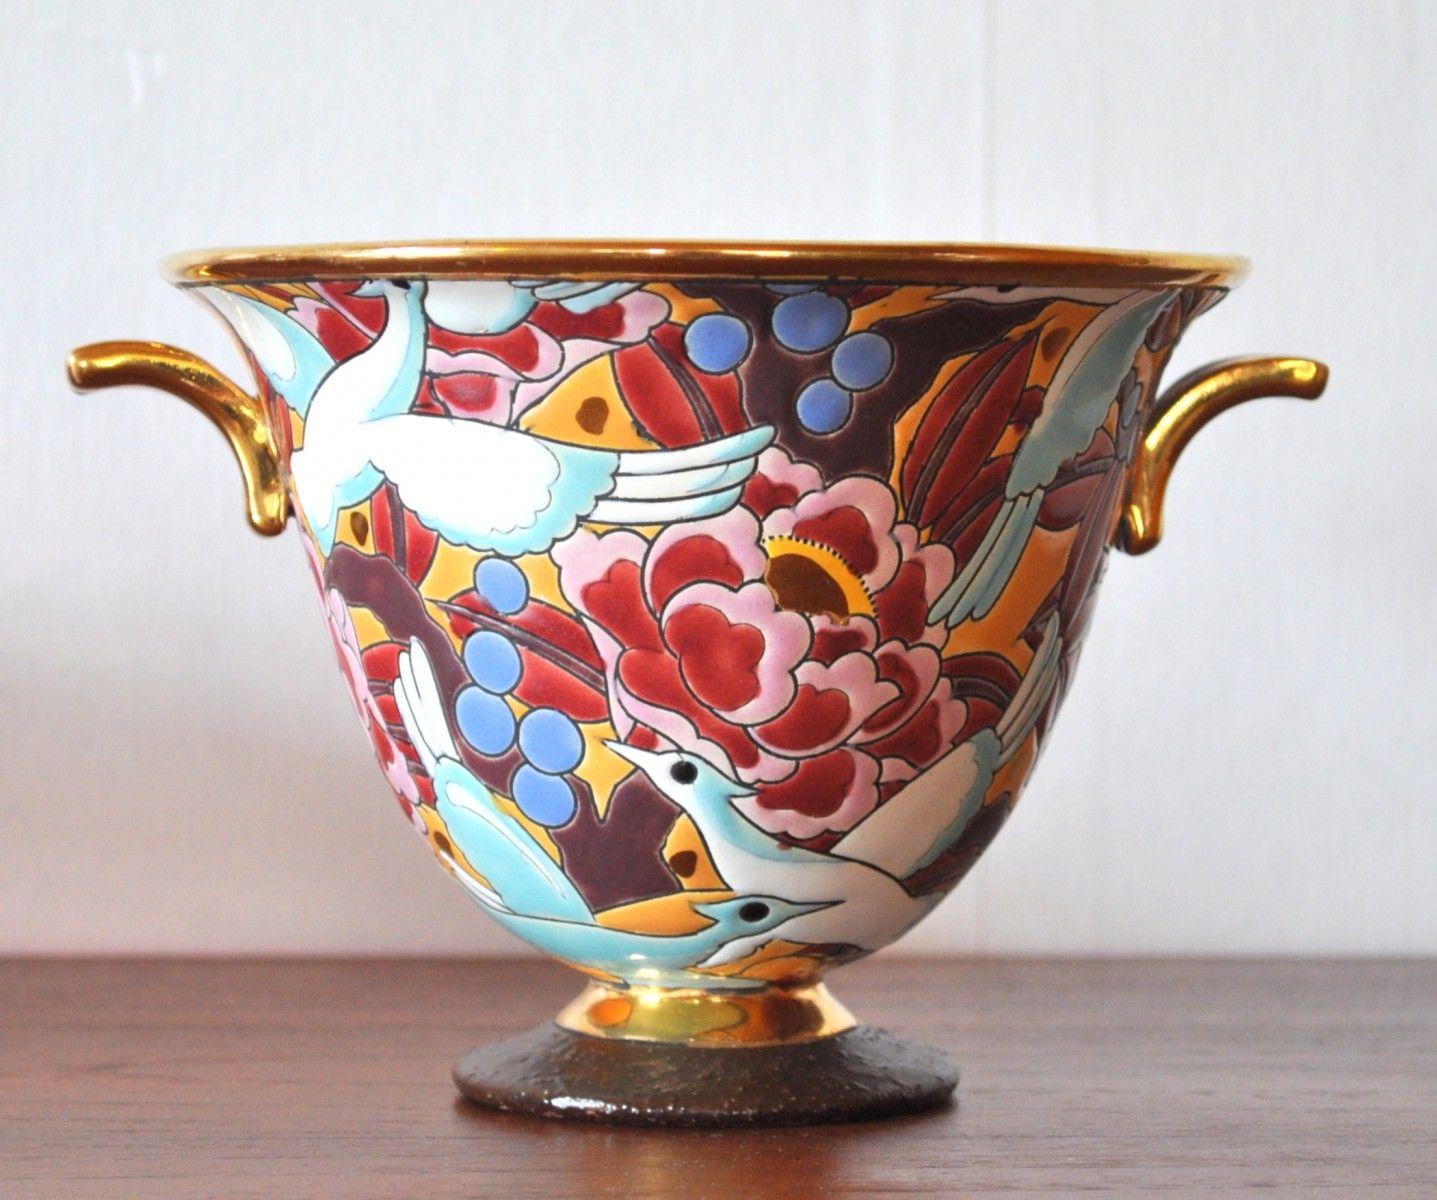 Art Deco Porcelain Vase from Boch